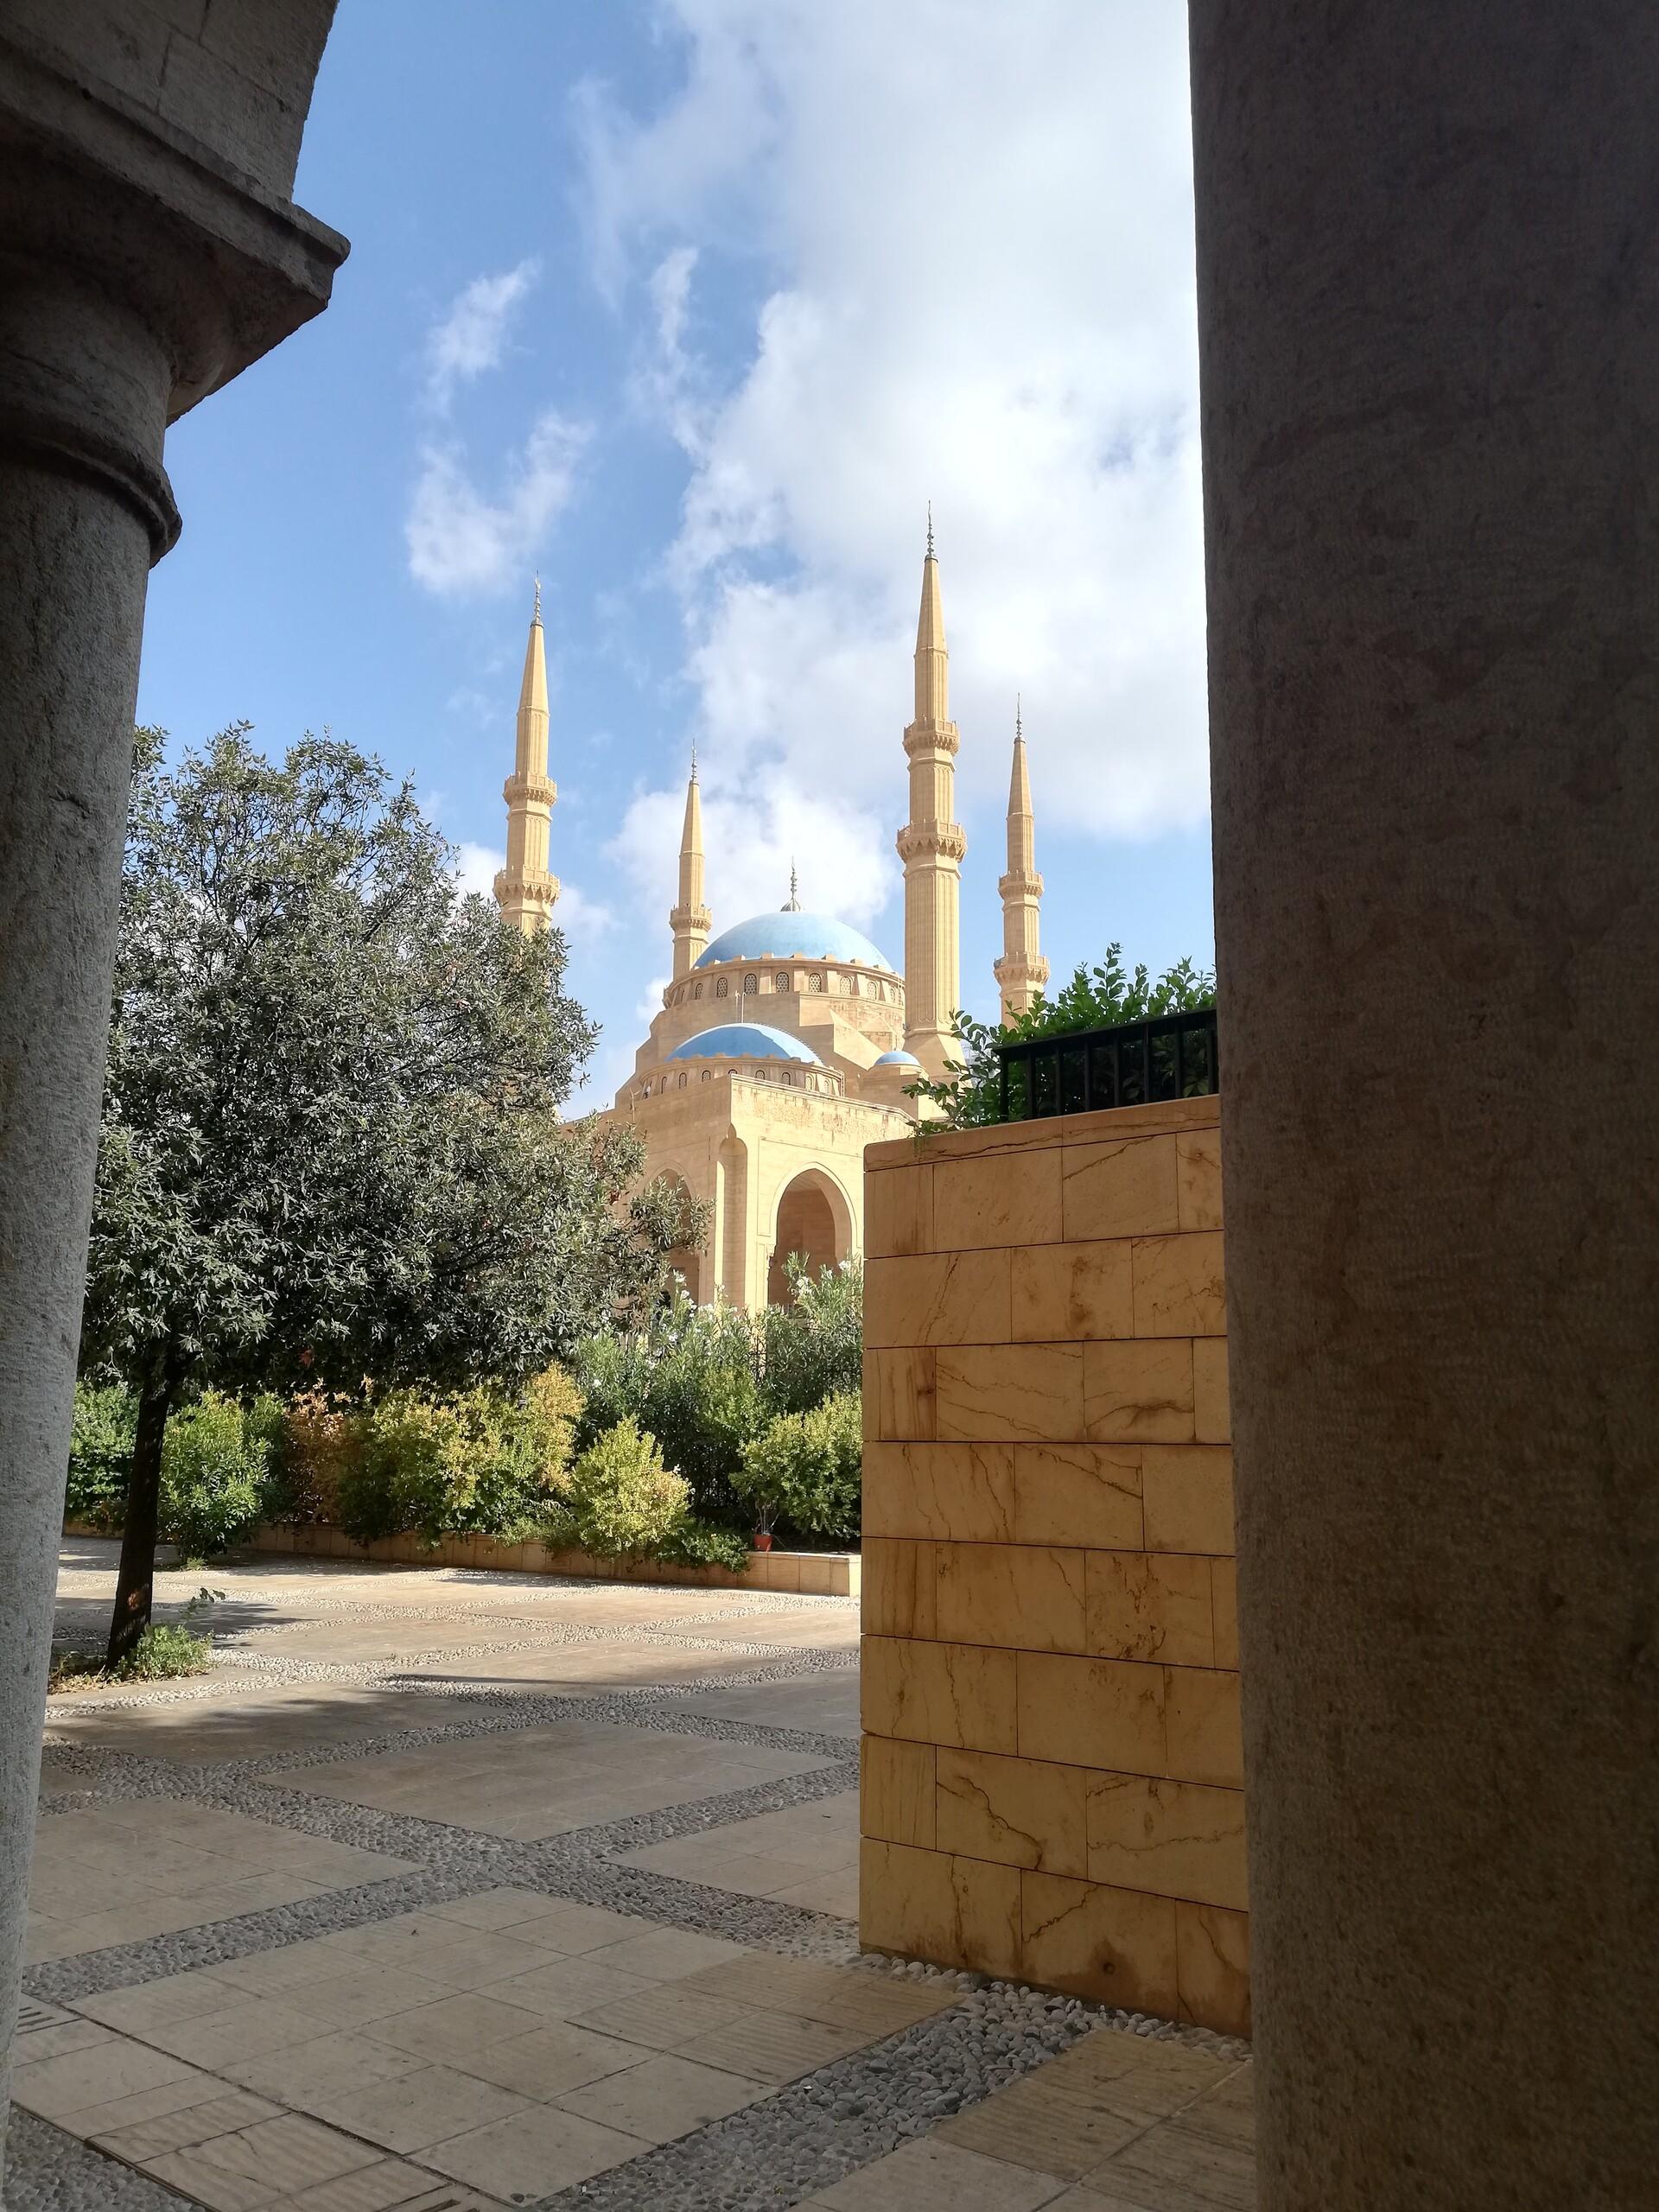 Beirut, the Middle East Paris